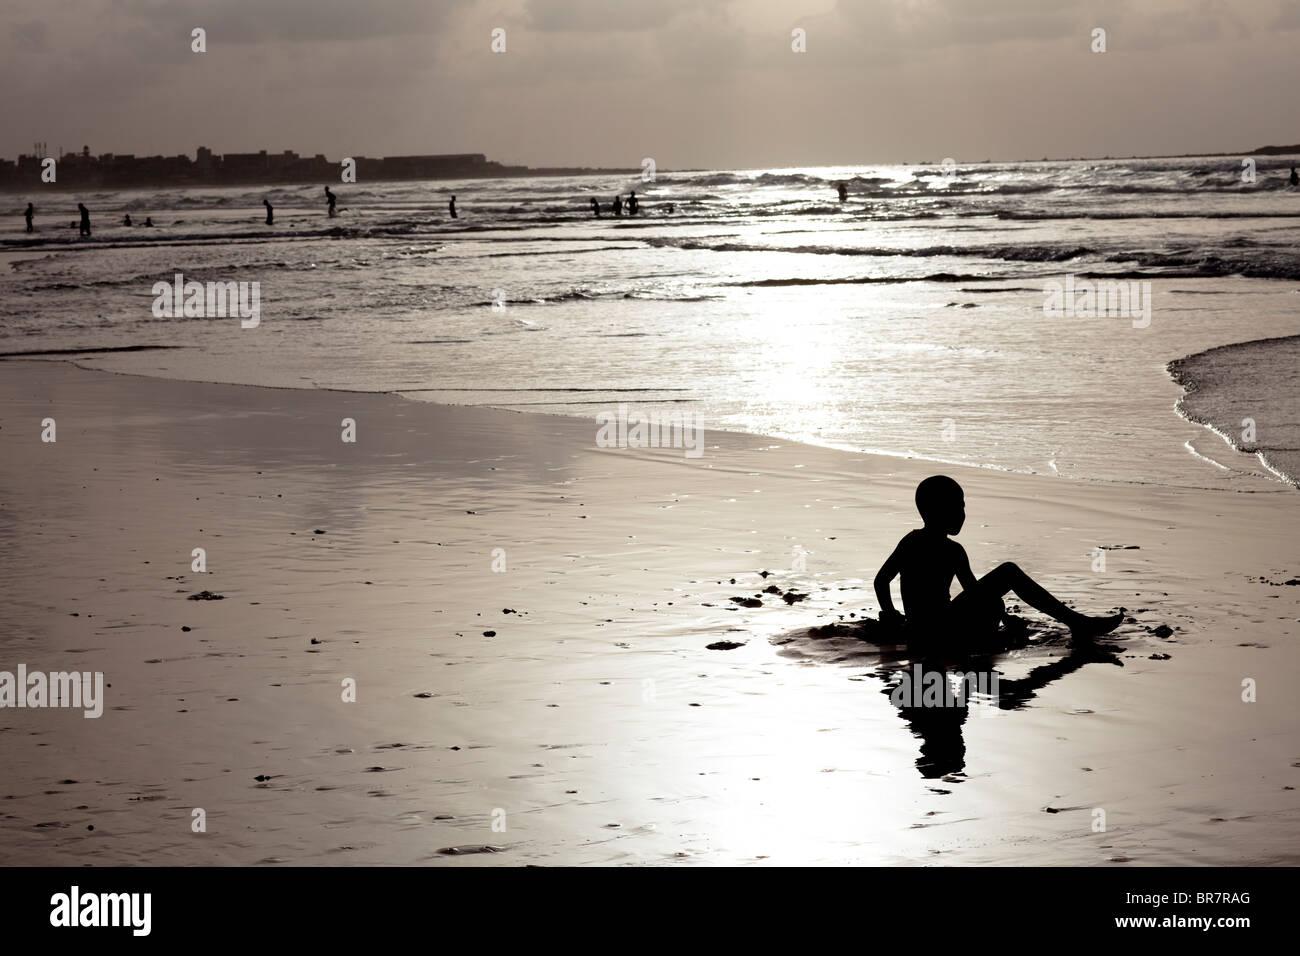 Beach and island life, Dakar, Senegal, Africa - Stock Image